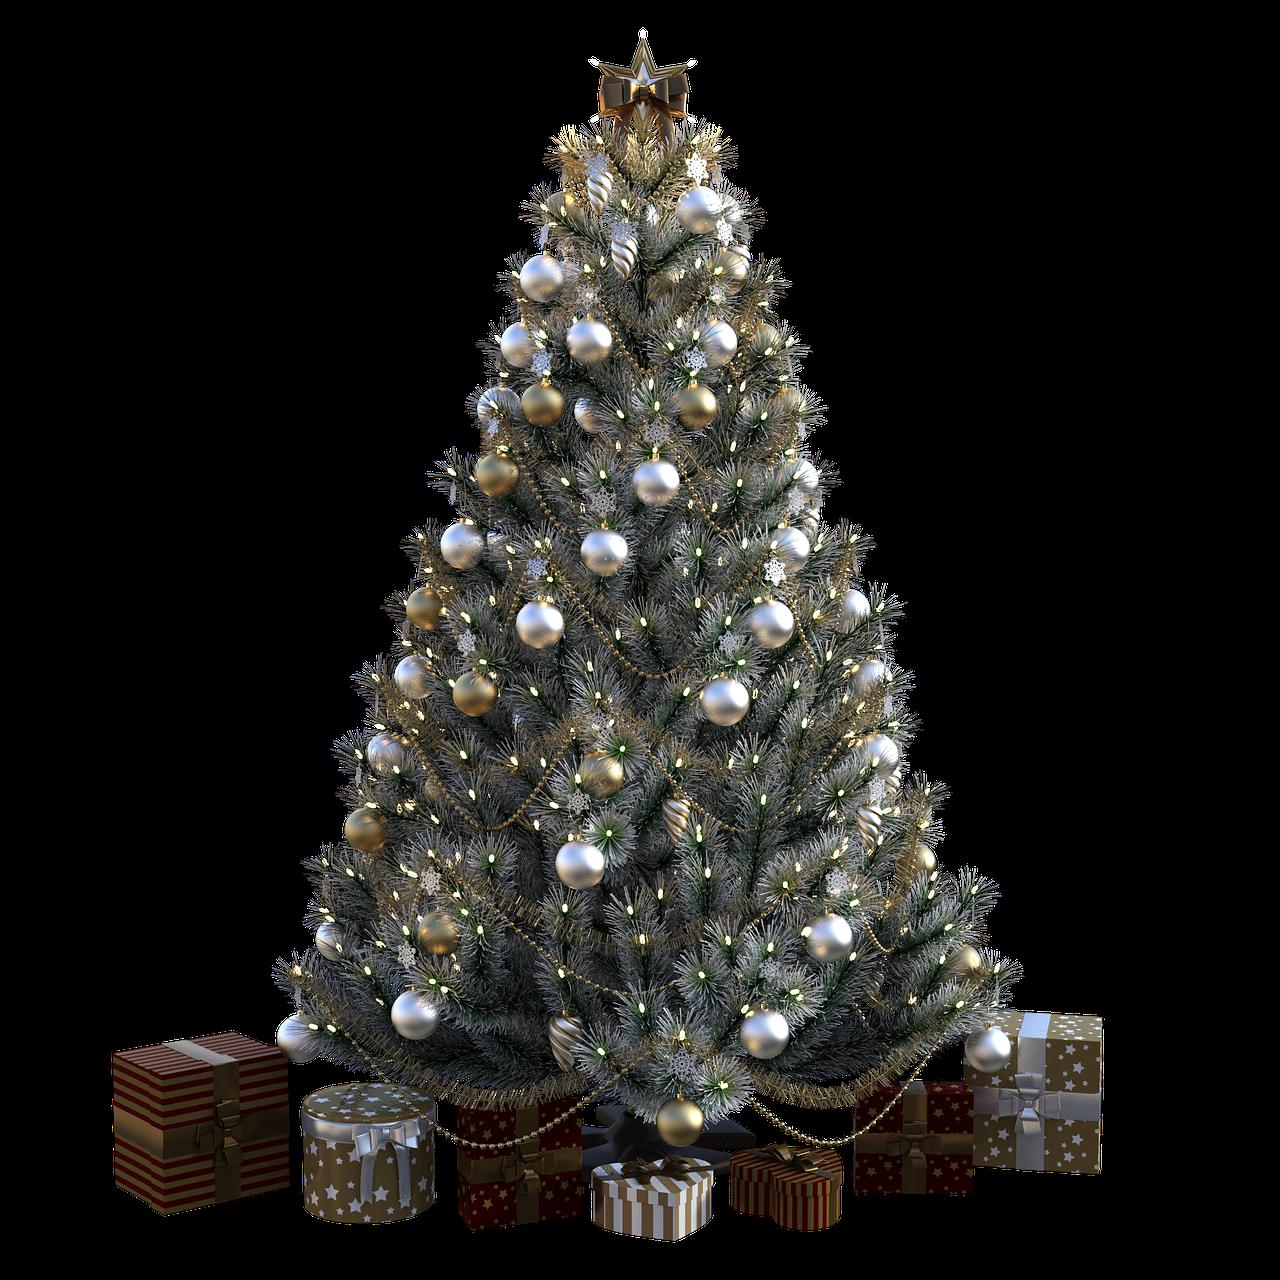 Christmas Tree Vintage Farmhouse Free Image On Pixabay